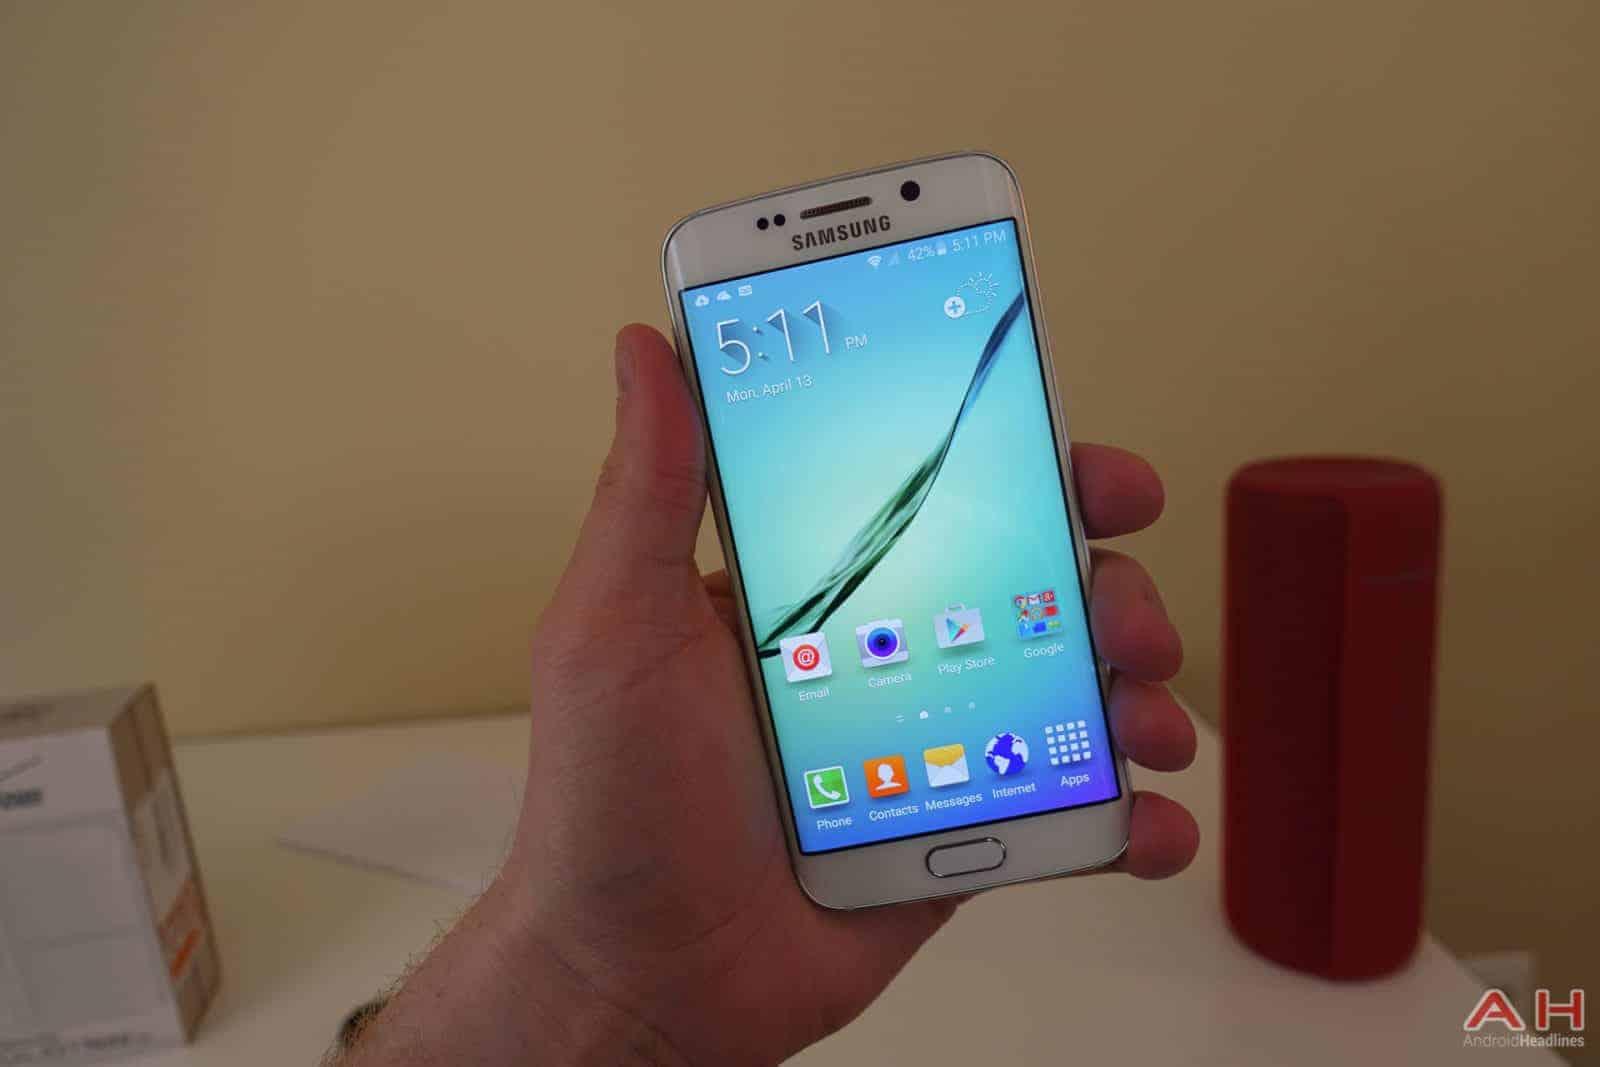 Samsung-Galaxy-S6-Edge-AH-1